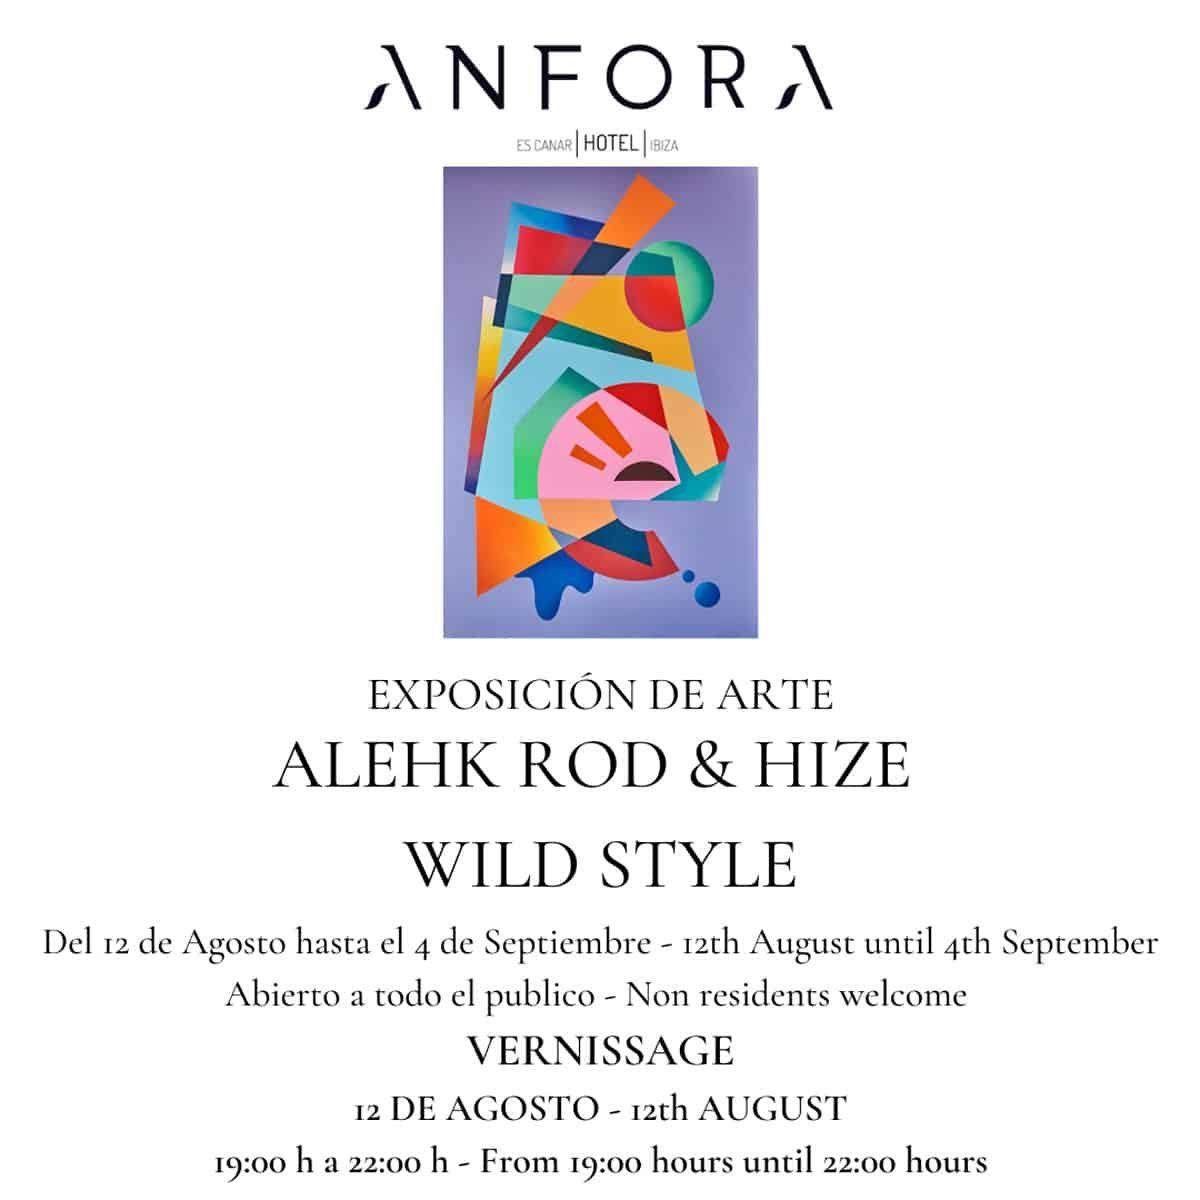 hotel-anfora-ibiza-2021-tentoonstelling-alehk-rod-hize-wild-style-welcometoibiza